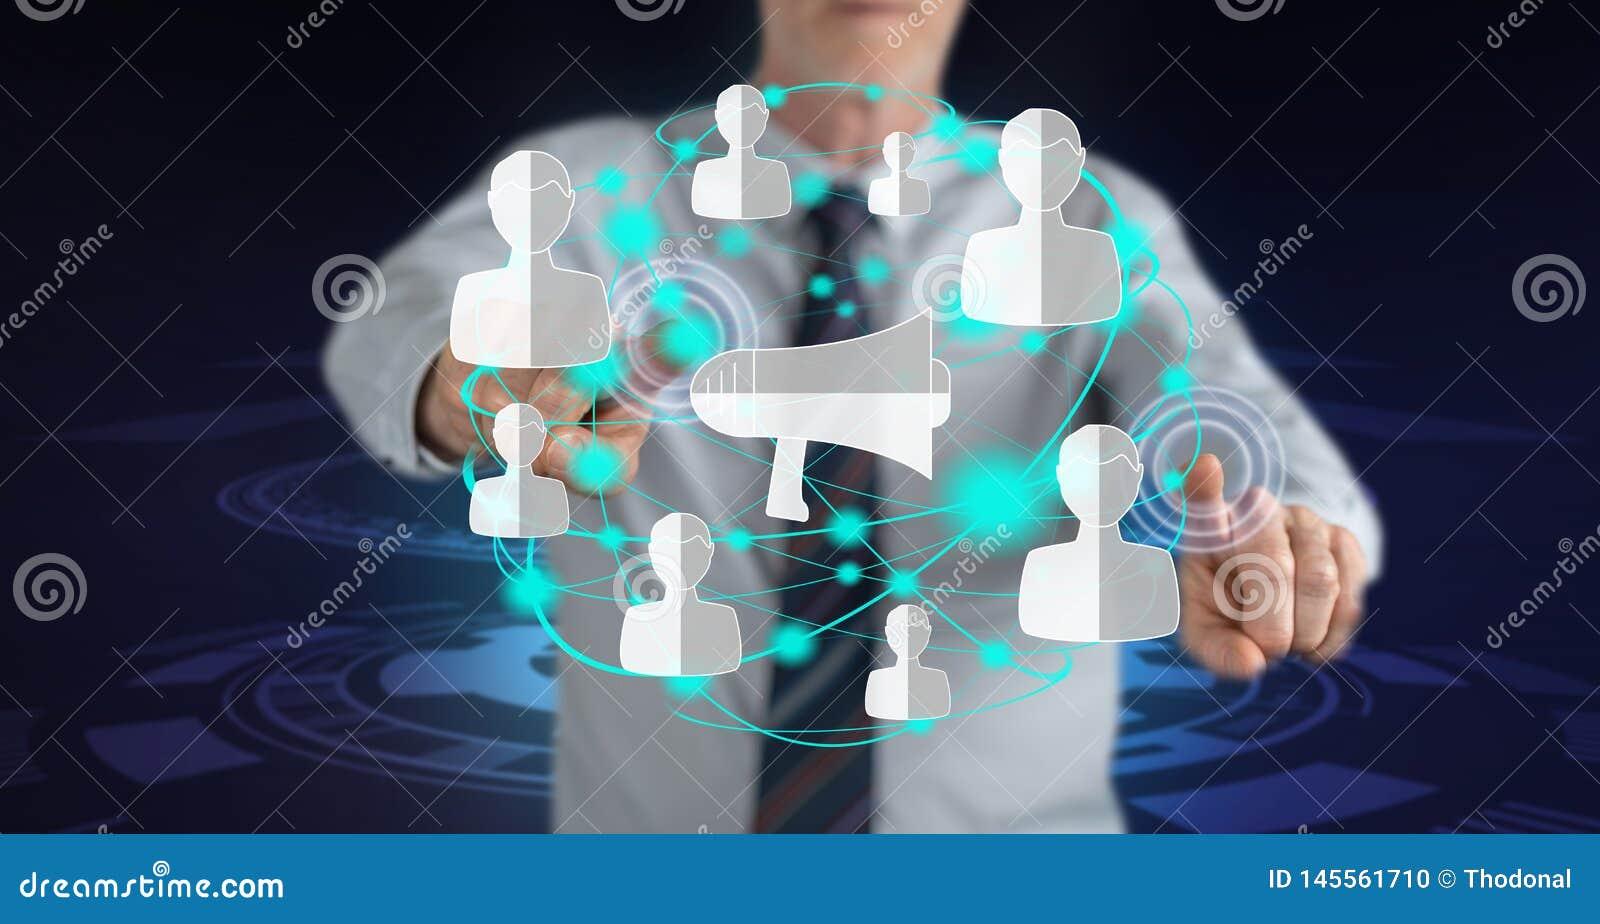 Man touching a social marketing concept